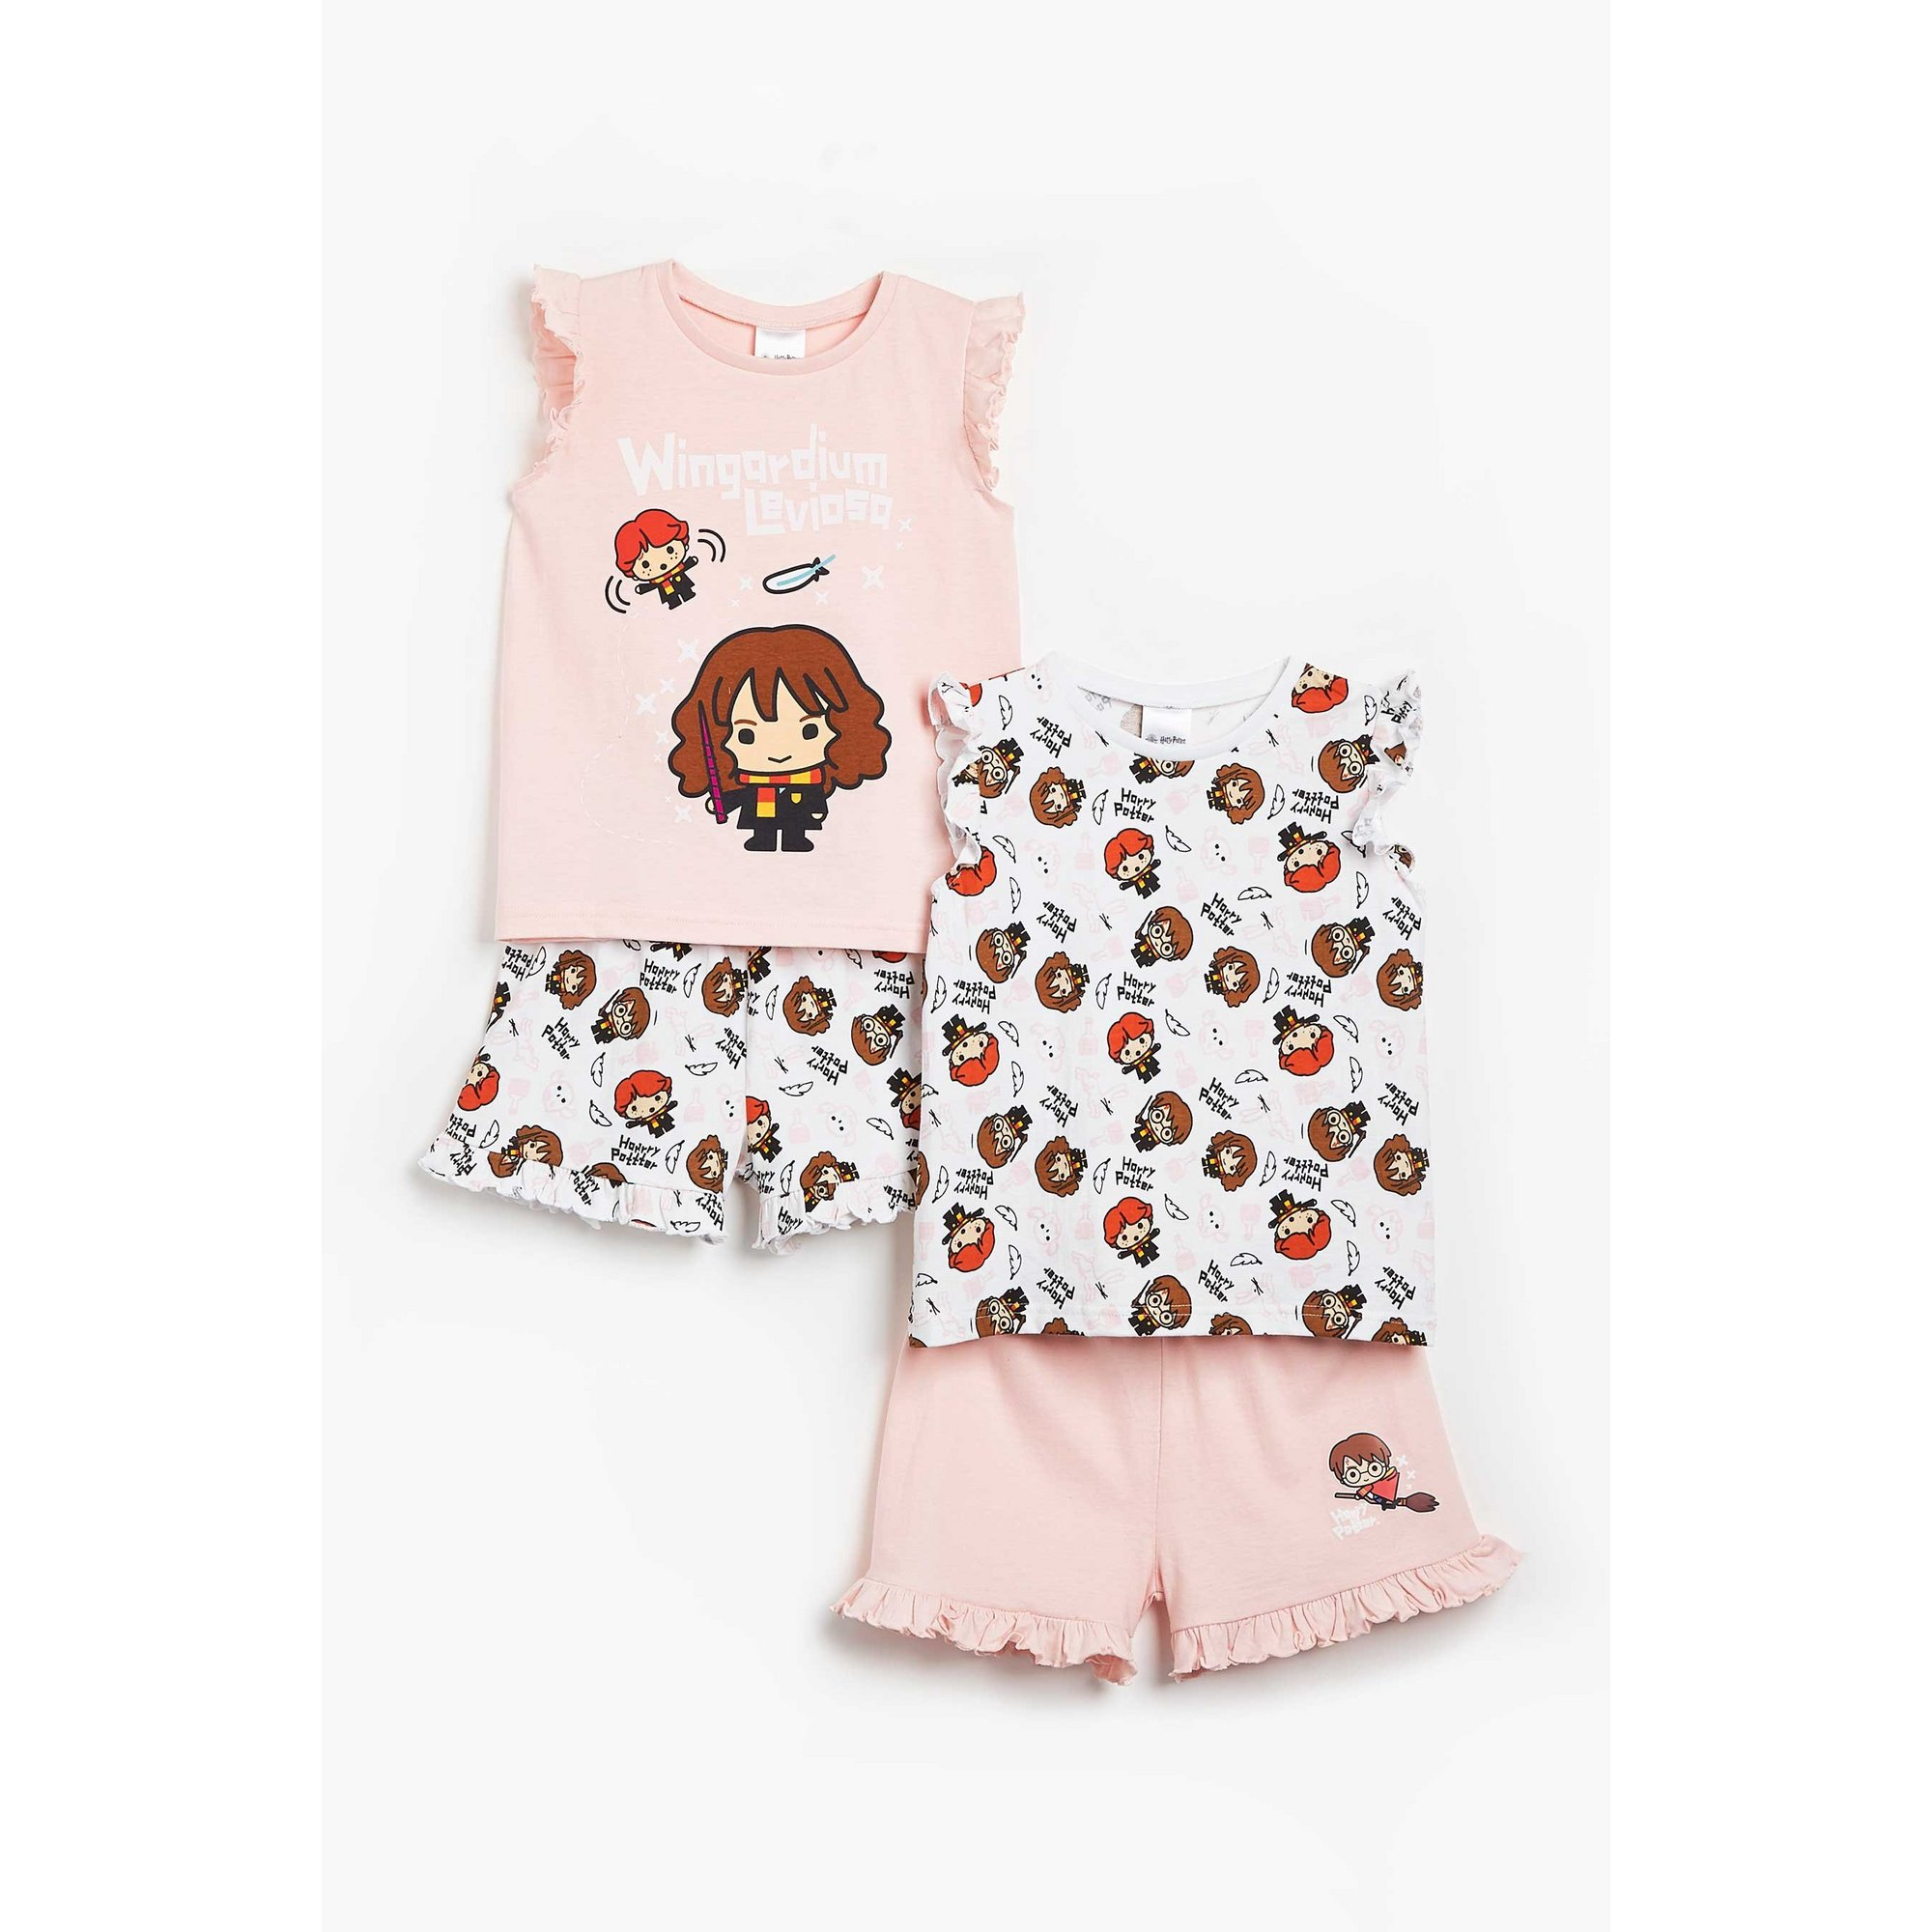 Image of Girls Pack of 2 Harry Potter Shortie Pyjamas